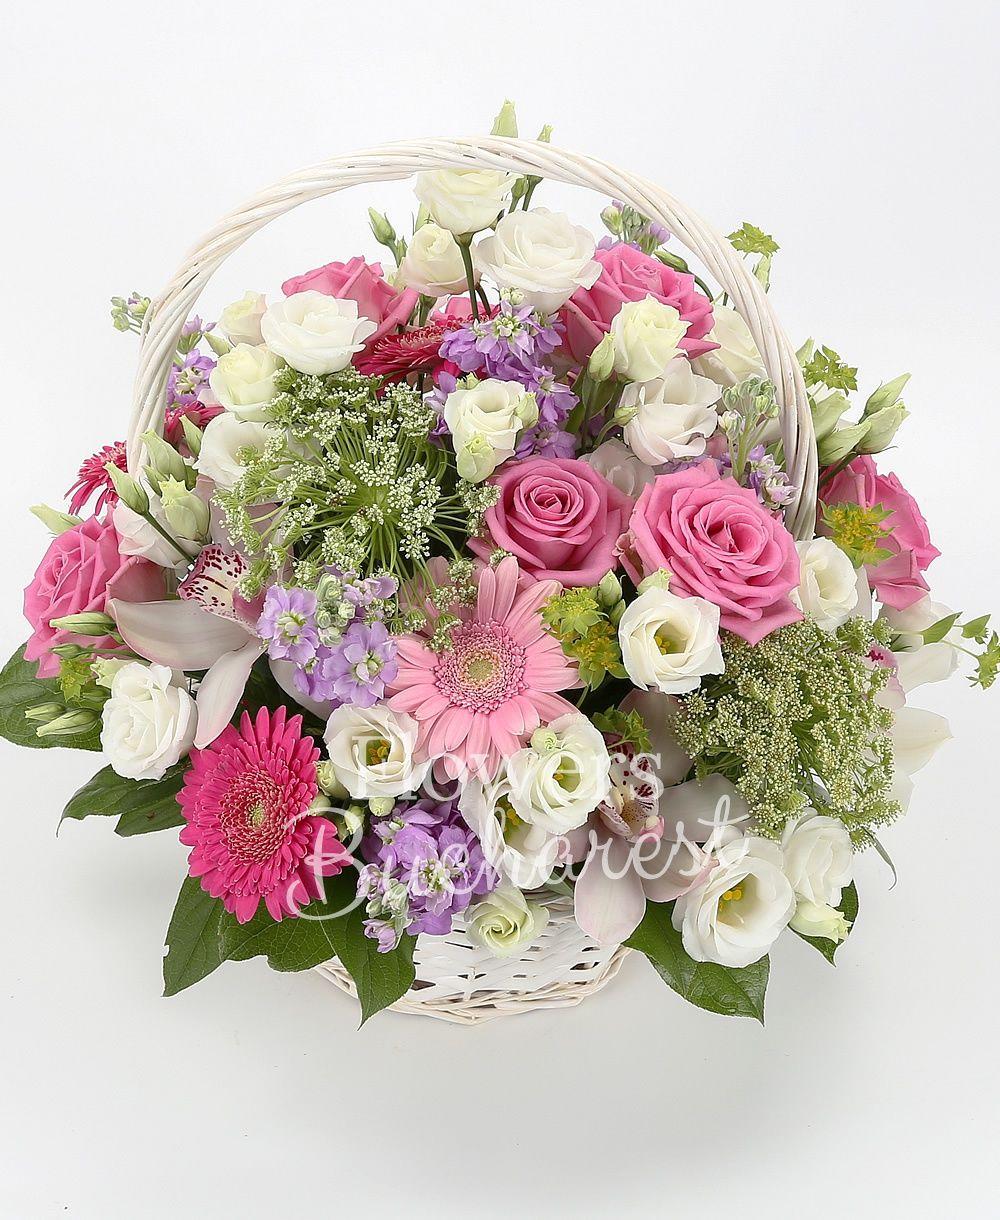 10 mauve matthiola, 10 pink roses, 5 gerbera, 5 lisianthus, white cymbidium, greenery